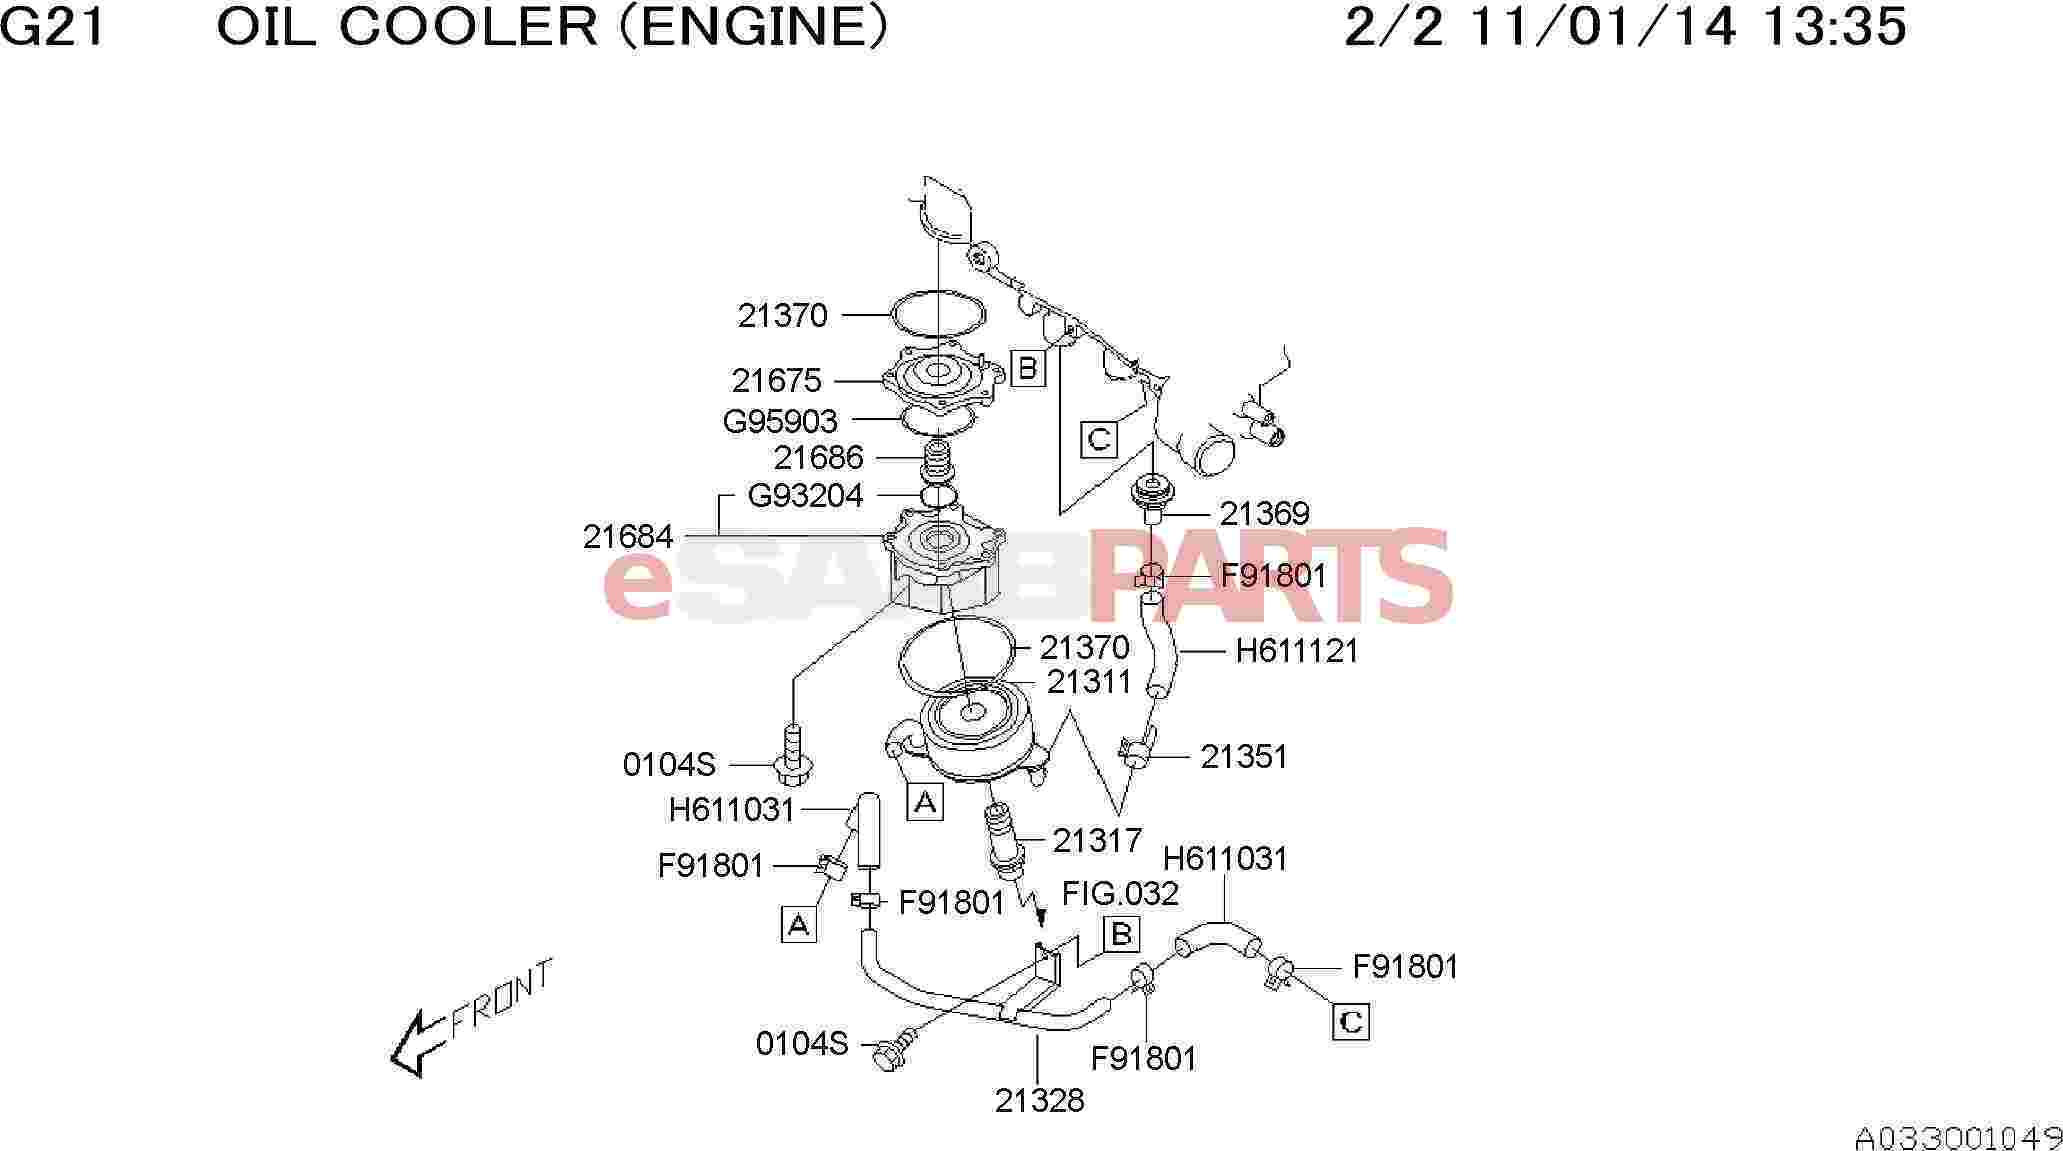 Wiring Diagram 1999 Saab 9 3 Speakers also Chrysler 2 4 Engine Diagram besides Significado De Las Marcas De Autos also Blok Silnika 2003 2008 B207 in addition Saab Car Wallpaper. on saab aero x